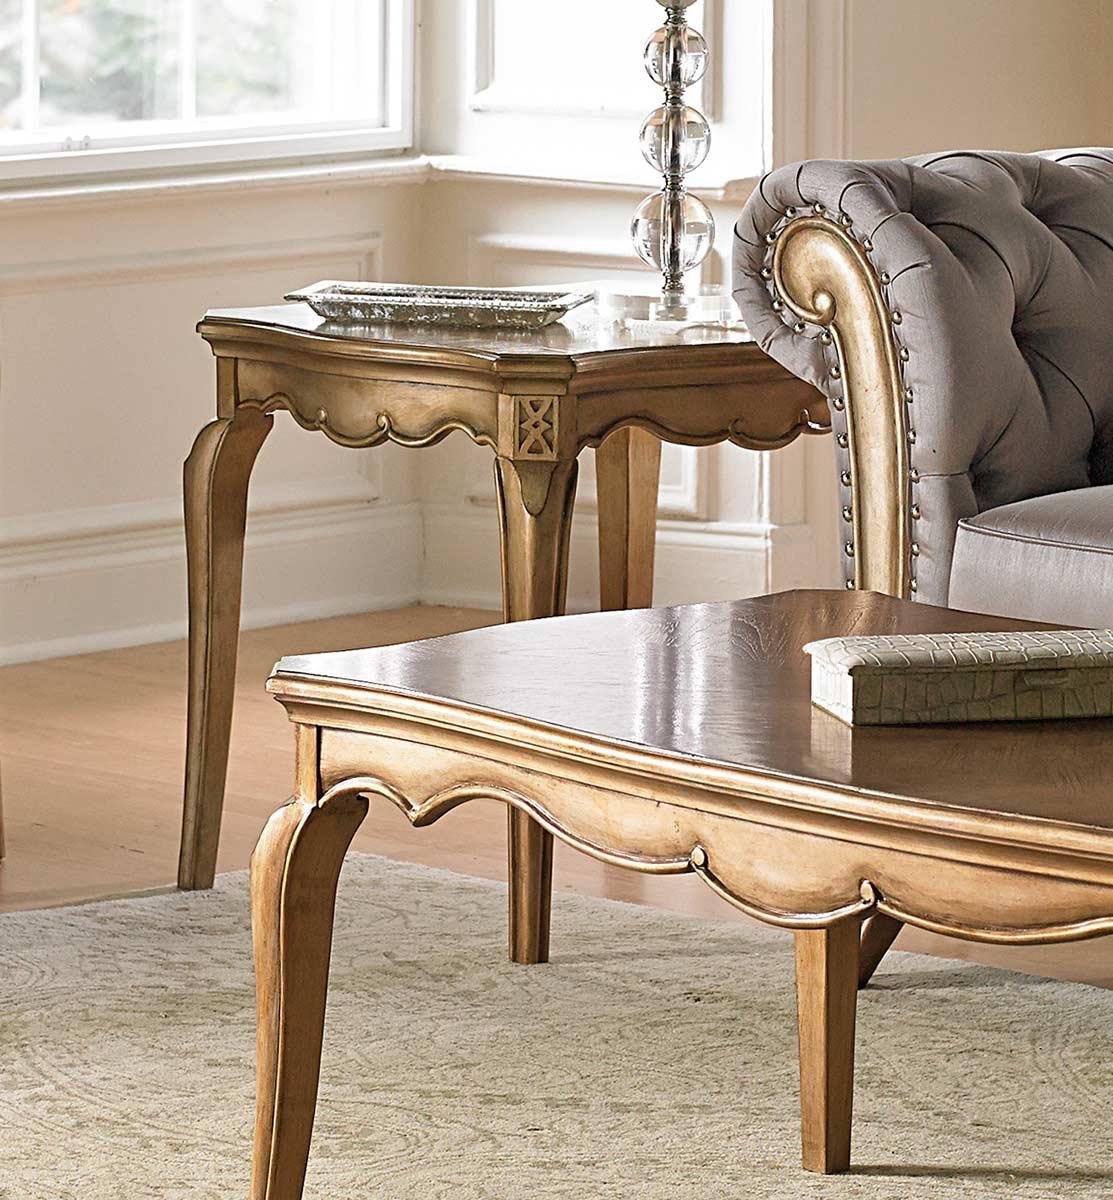 Homelegance Chambord End Table - Champagne Gold